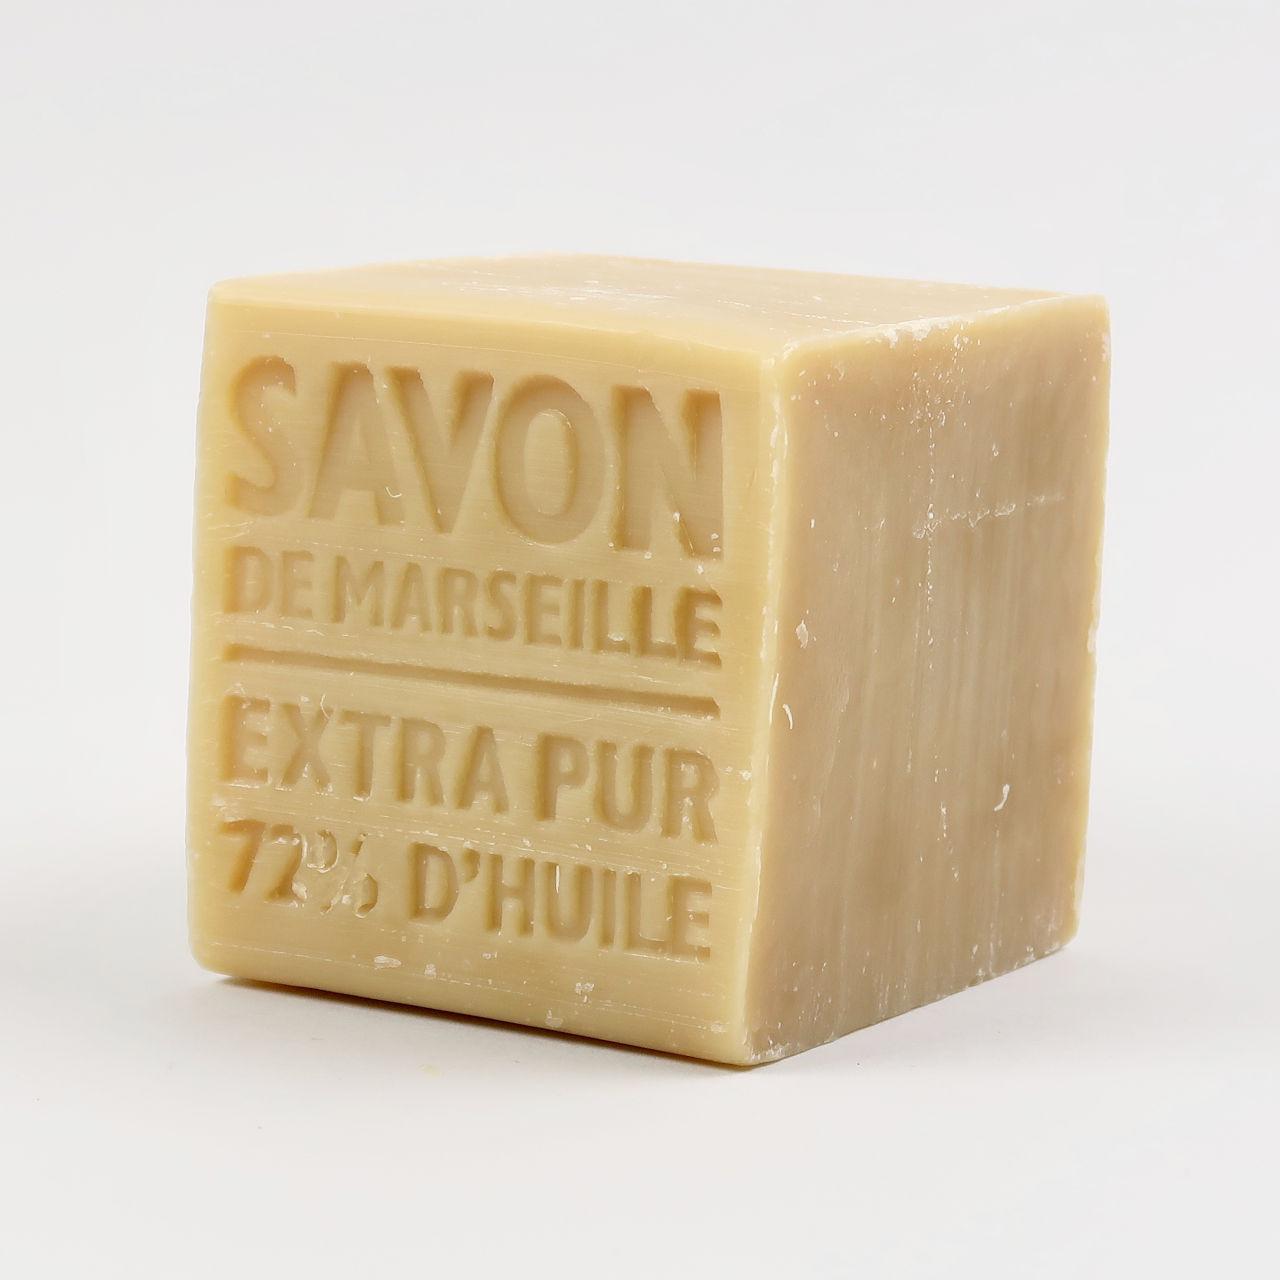 Savon Marseille Cube - Fragrance Free